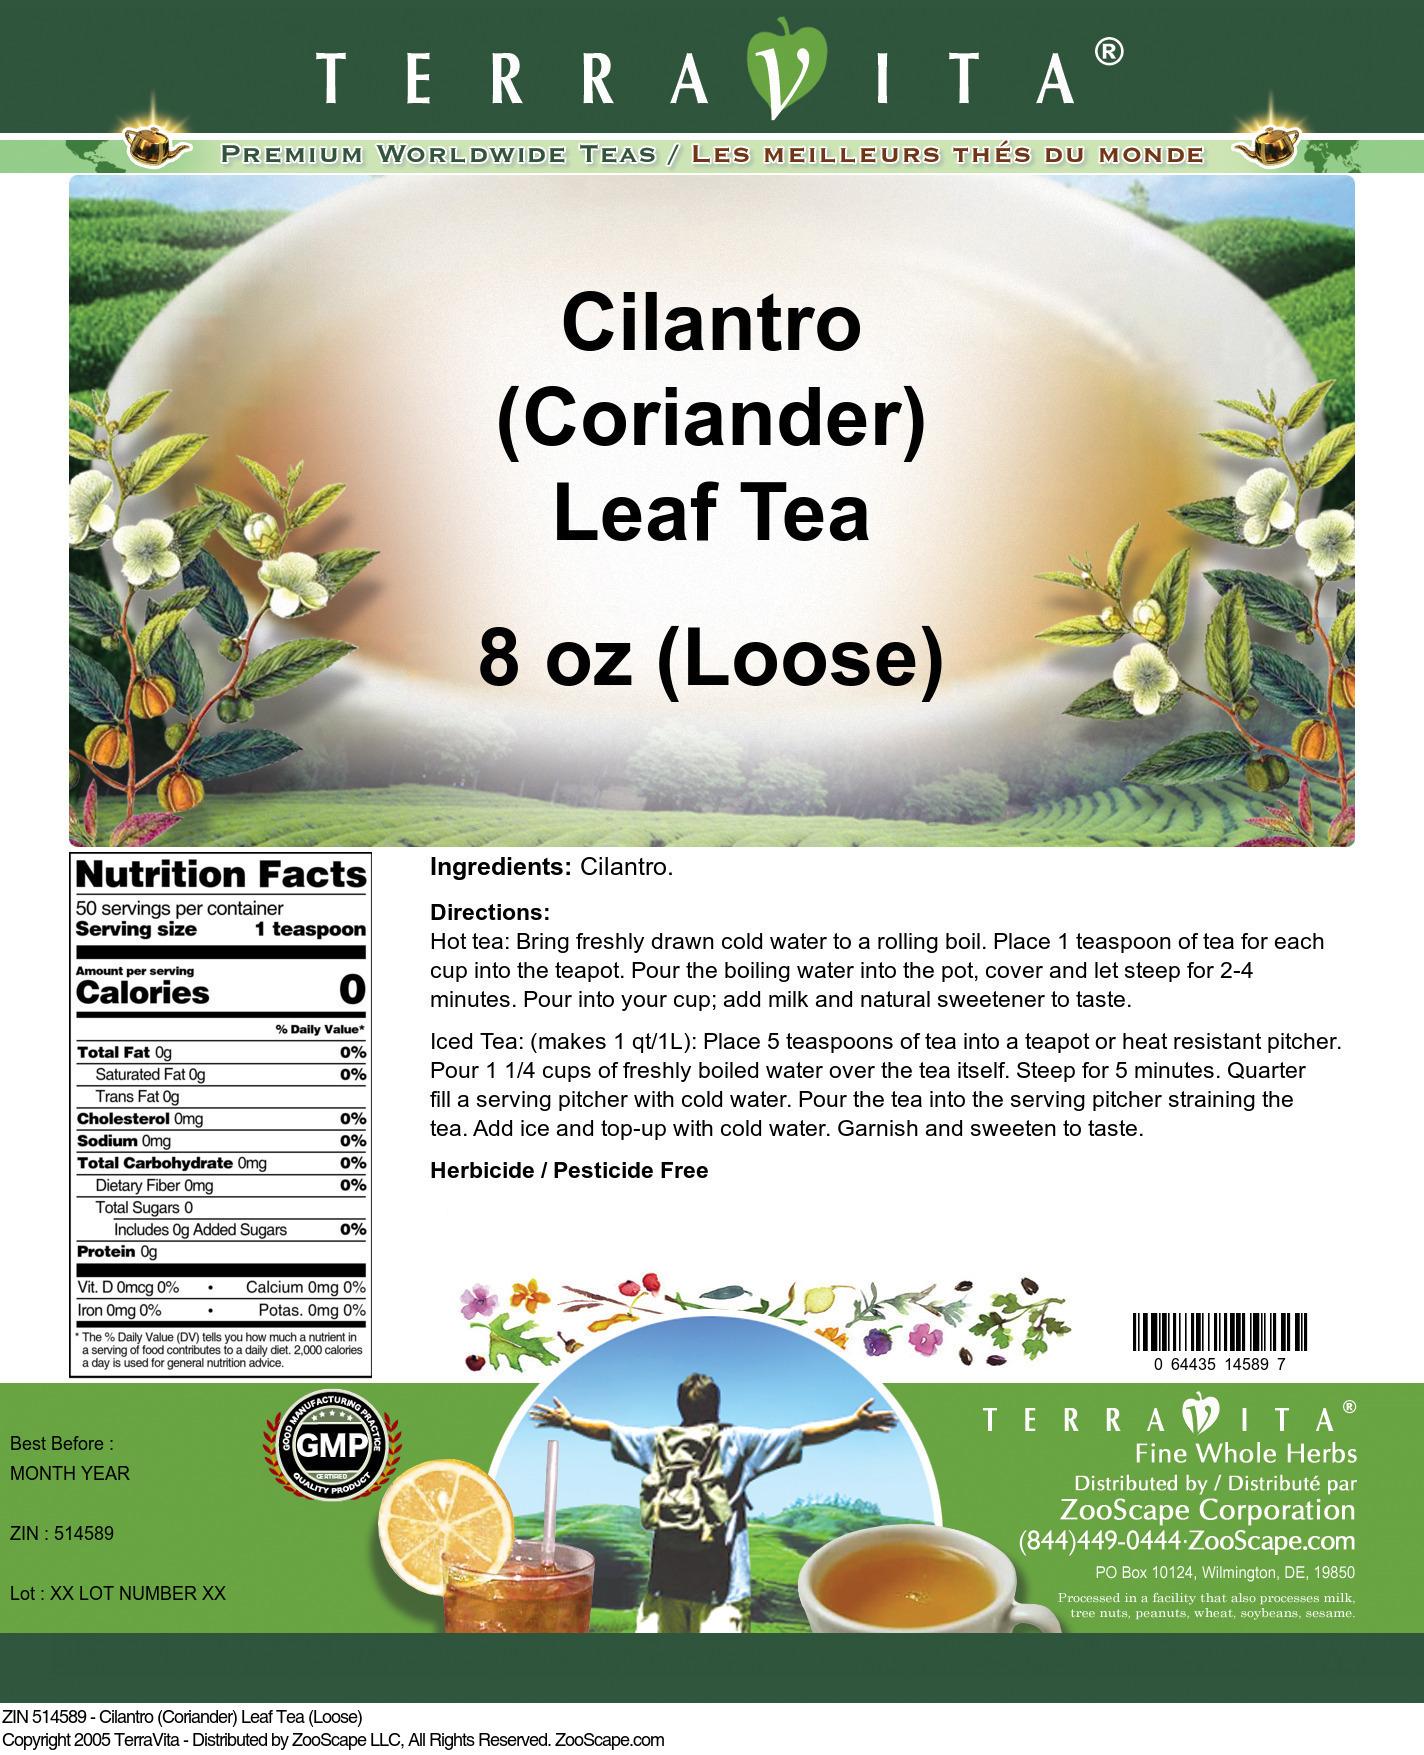 Cilantro (Coriander) Leaf Tea (Loose)